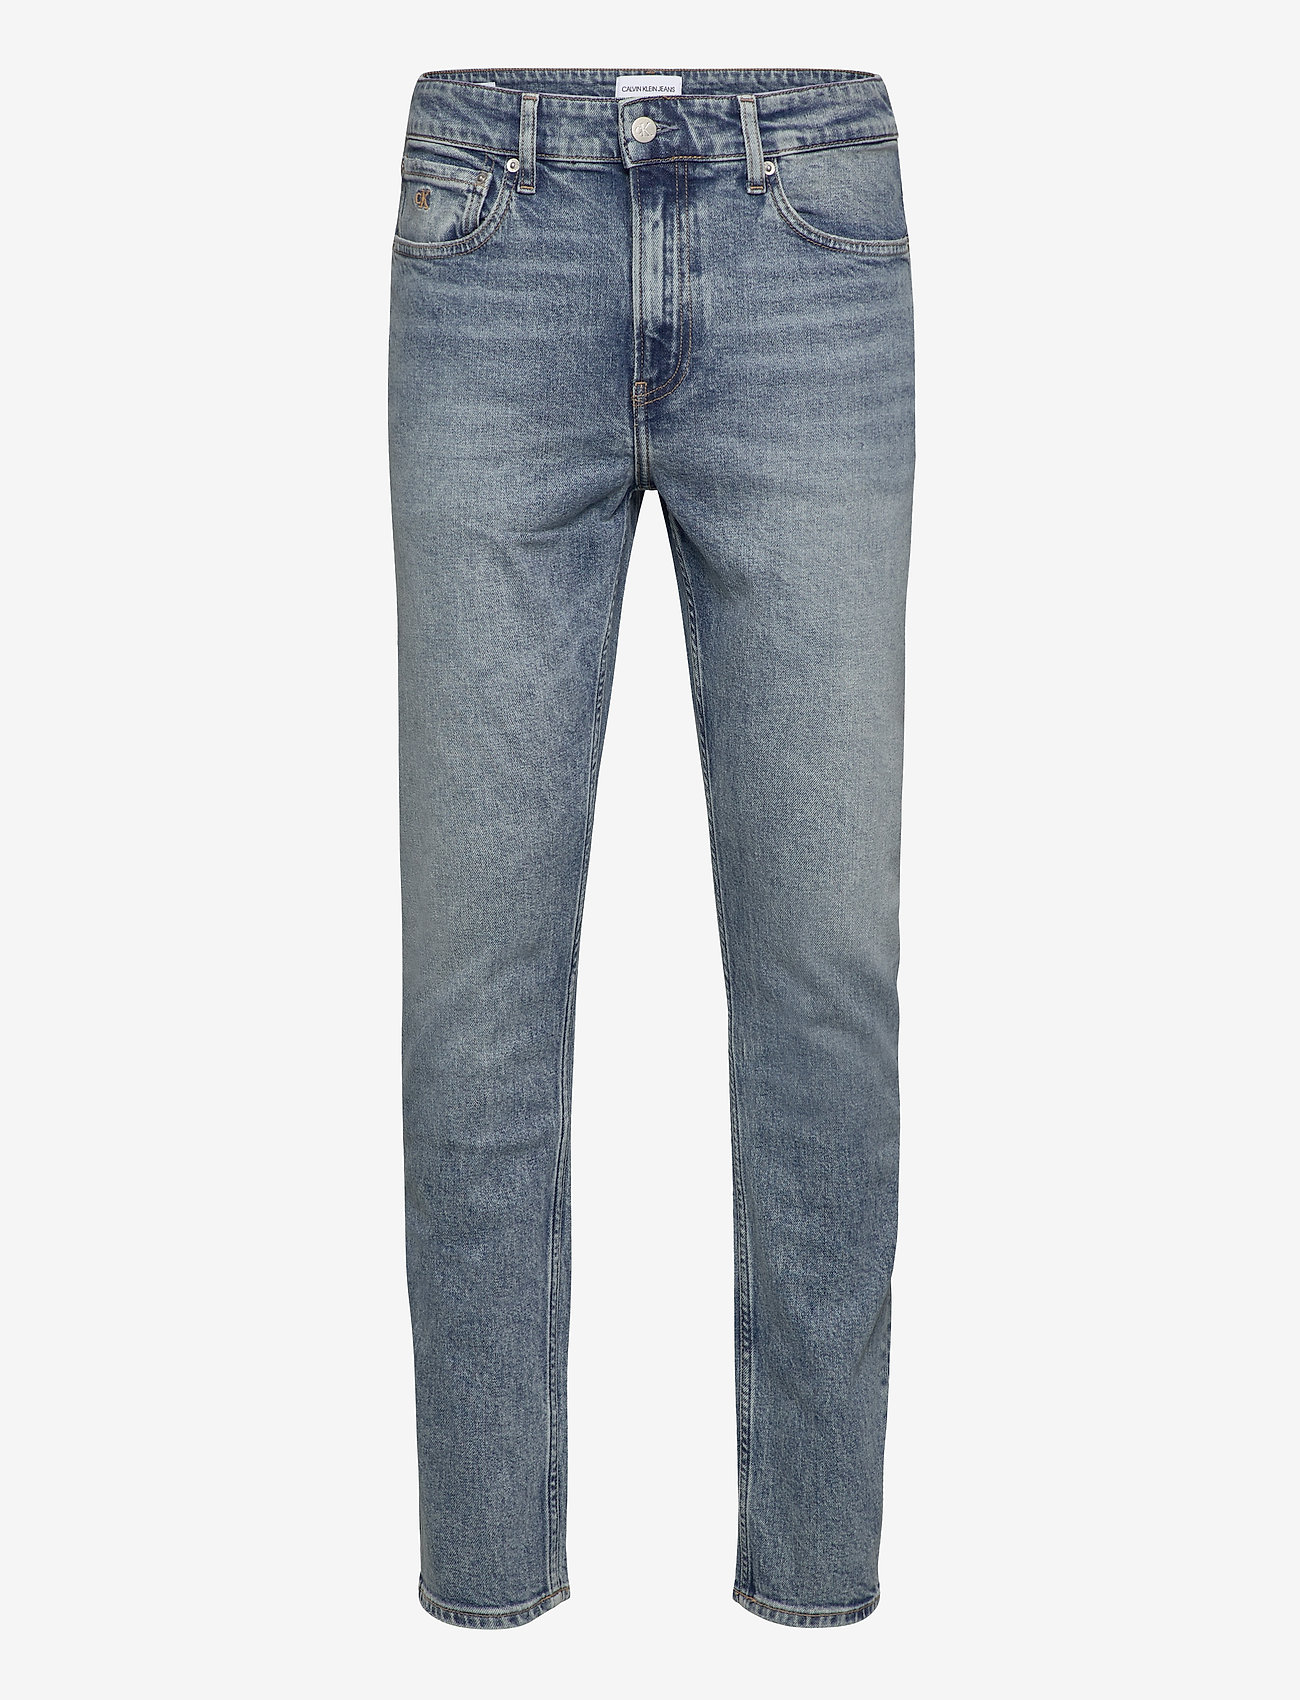 Calvin Klein Jeans - CKJ 058 SLIM TAPER - slim jeans - ab112 light blue - 0